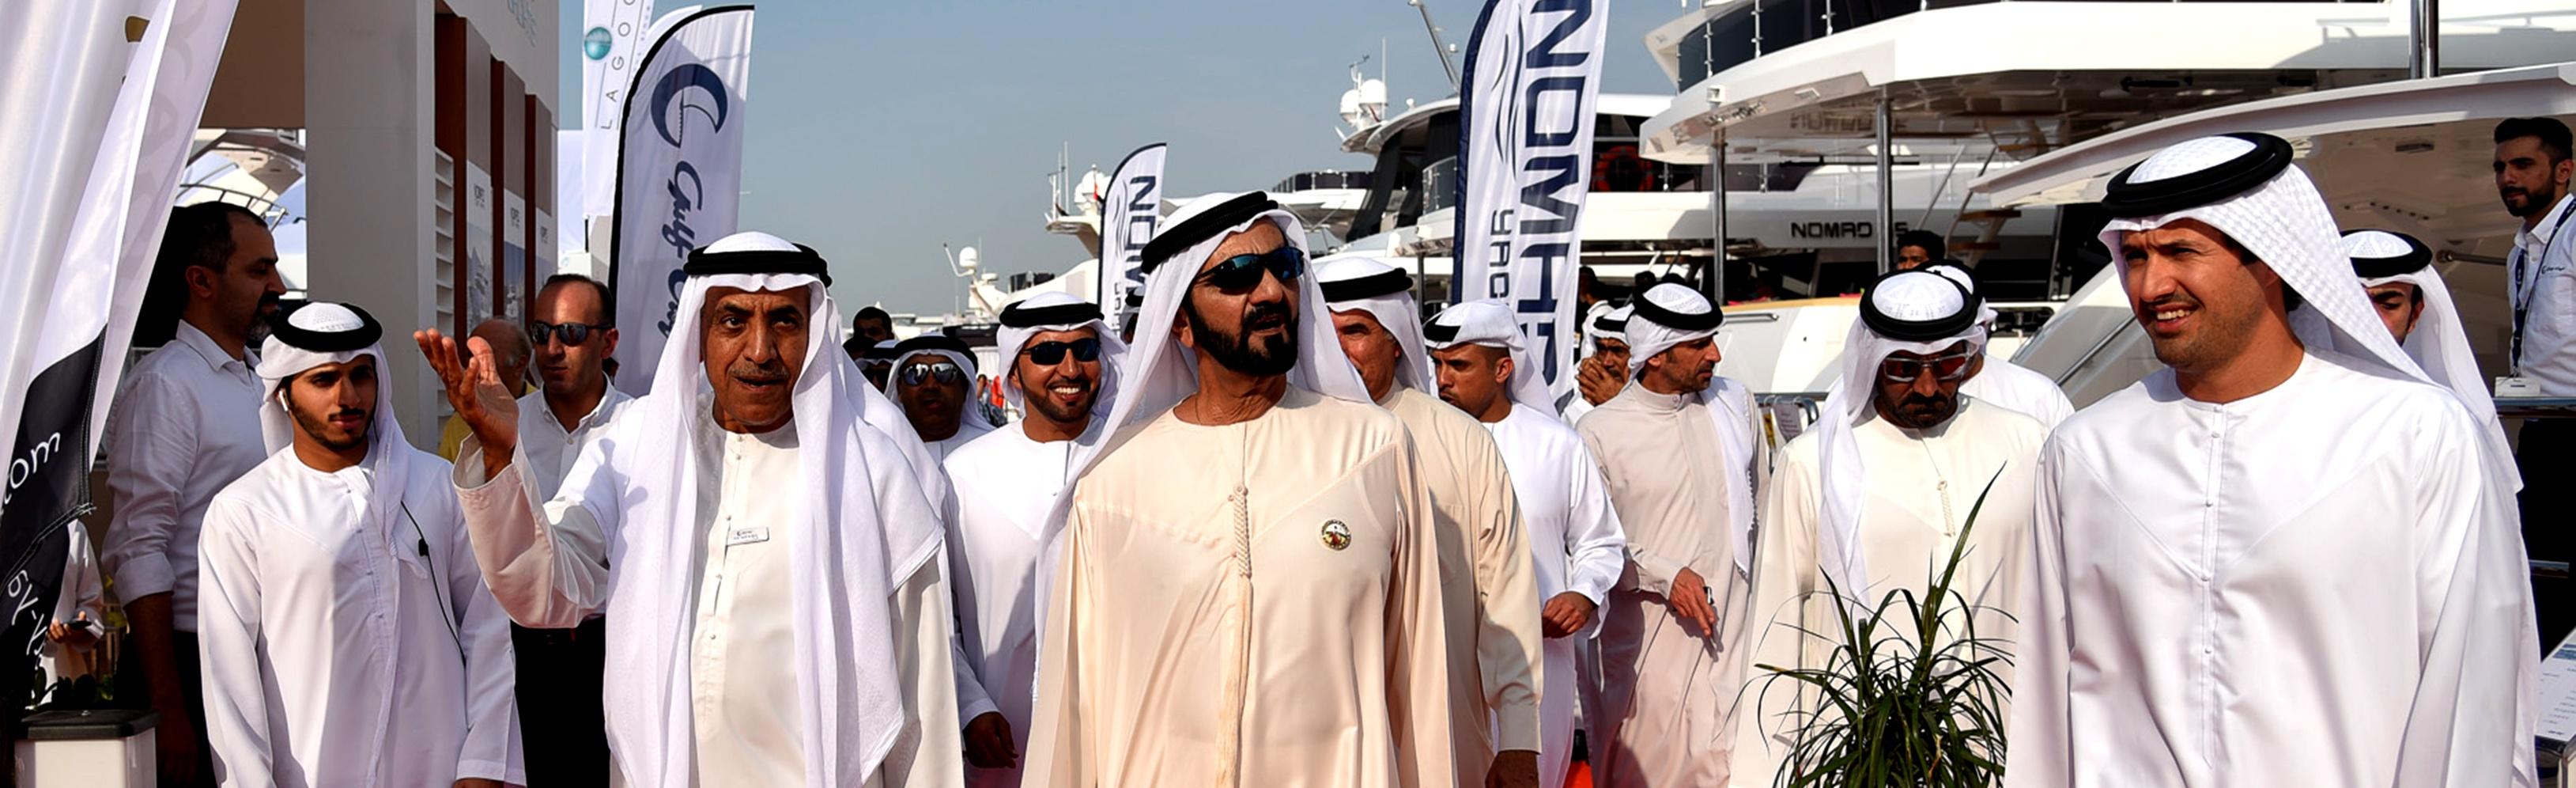 HH-Shk-Al-Maktoum-visits-Gulf-Craft.jpg